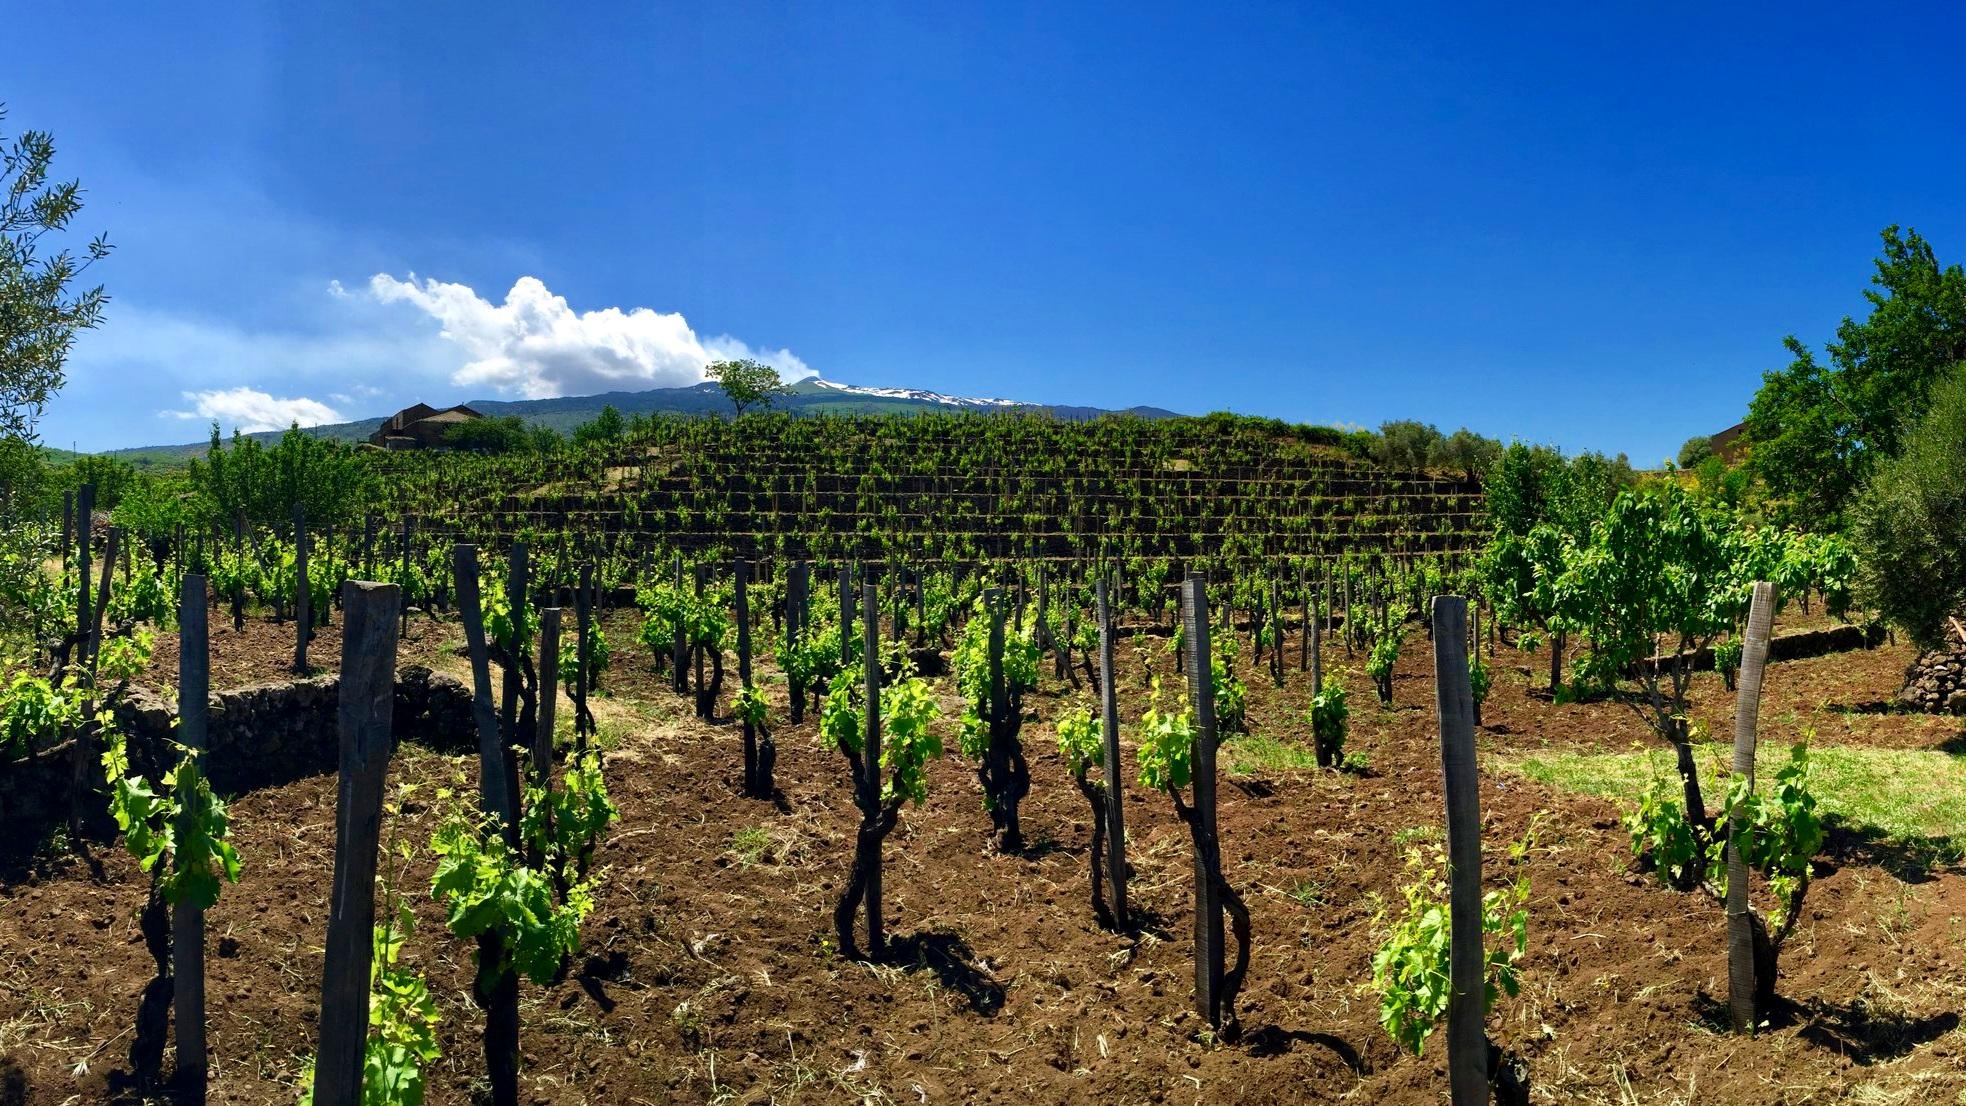 Mount Etna and the vine slopes - Passopisciaro